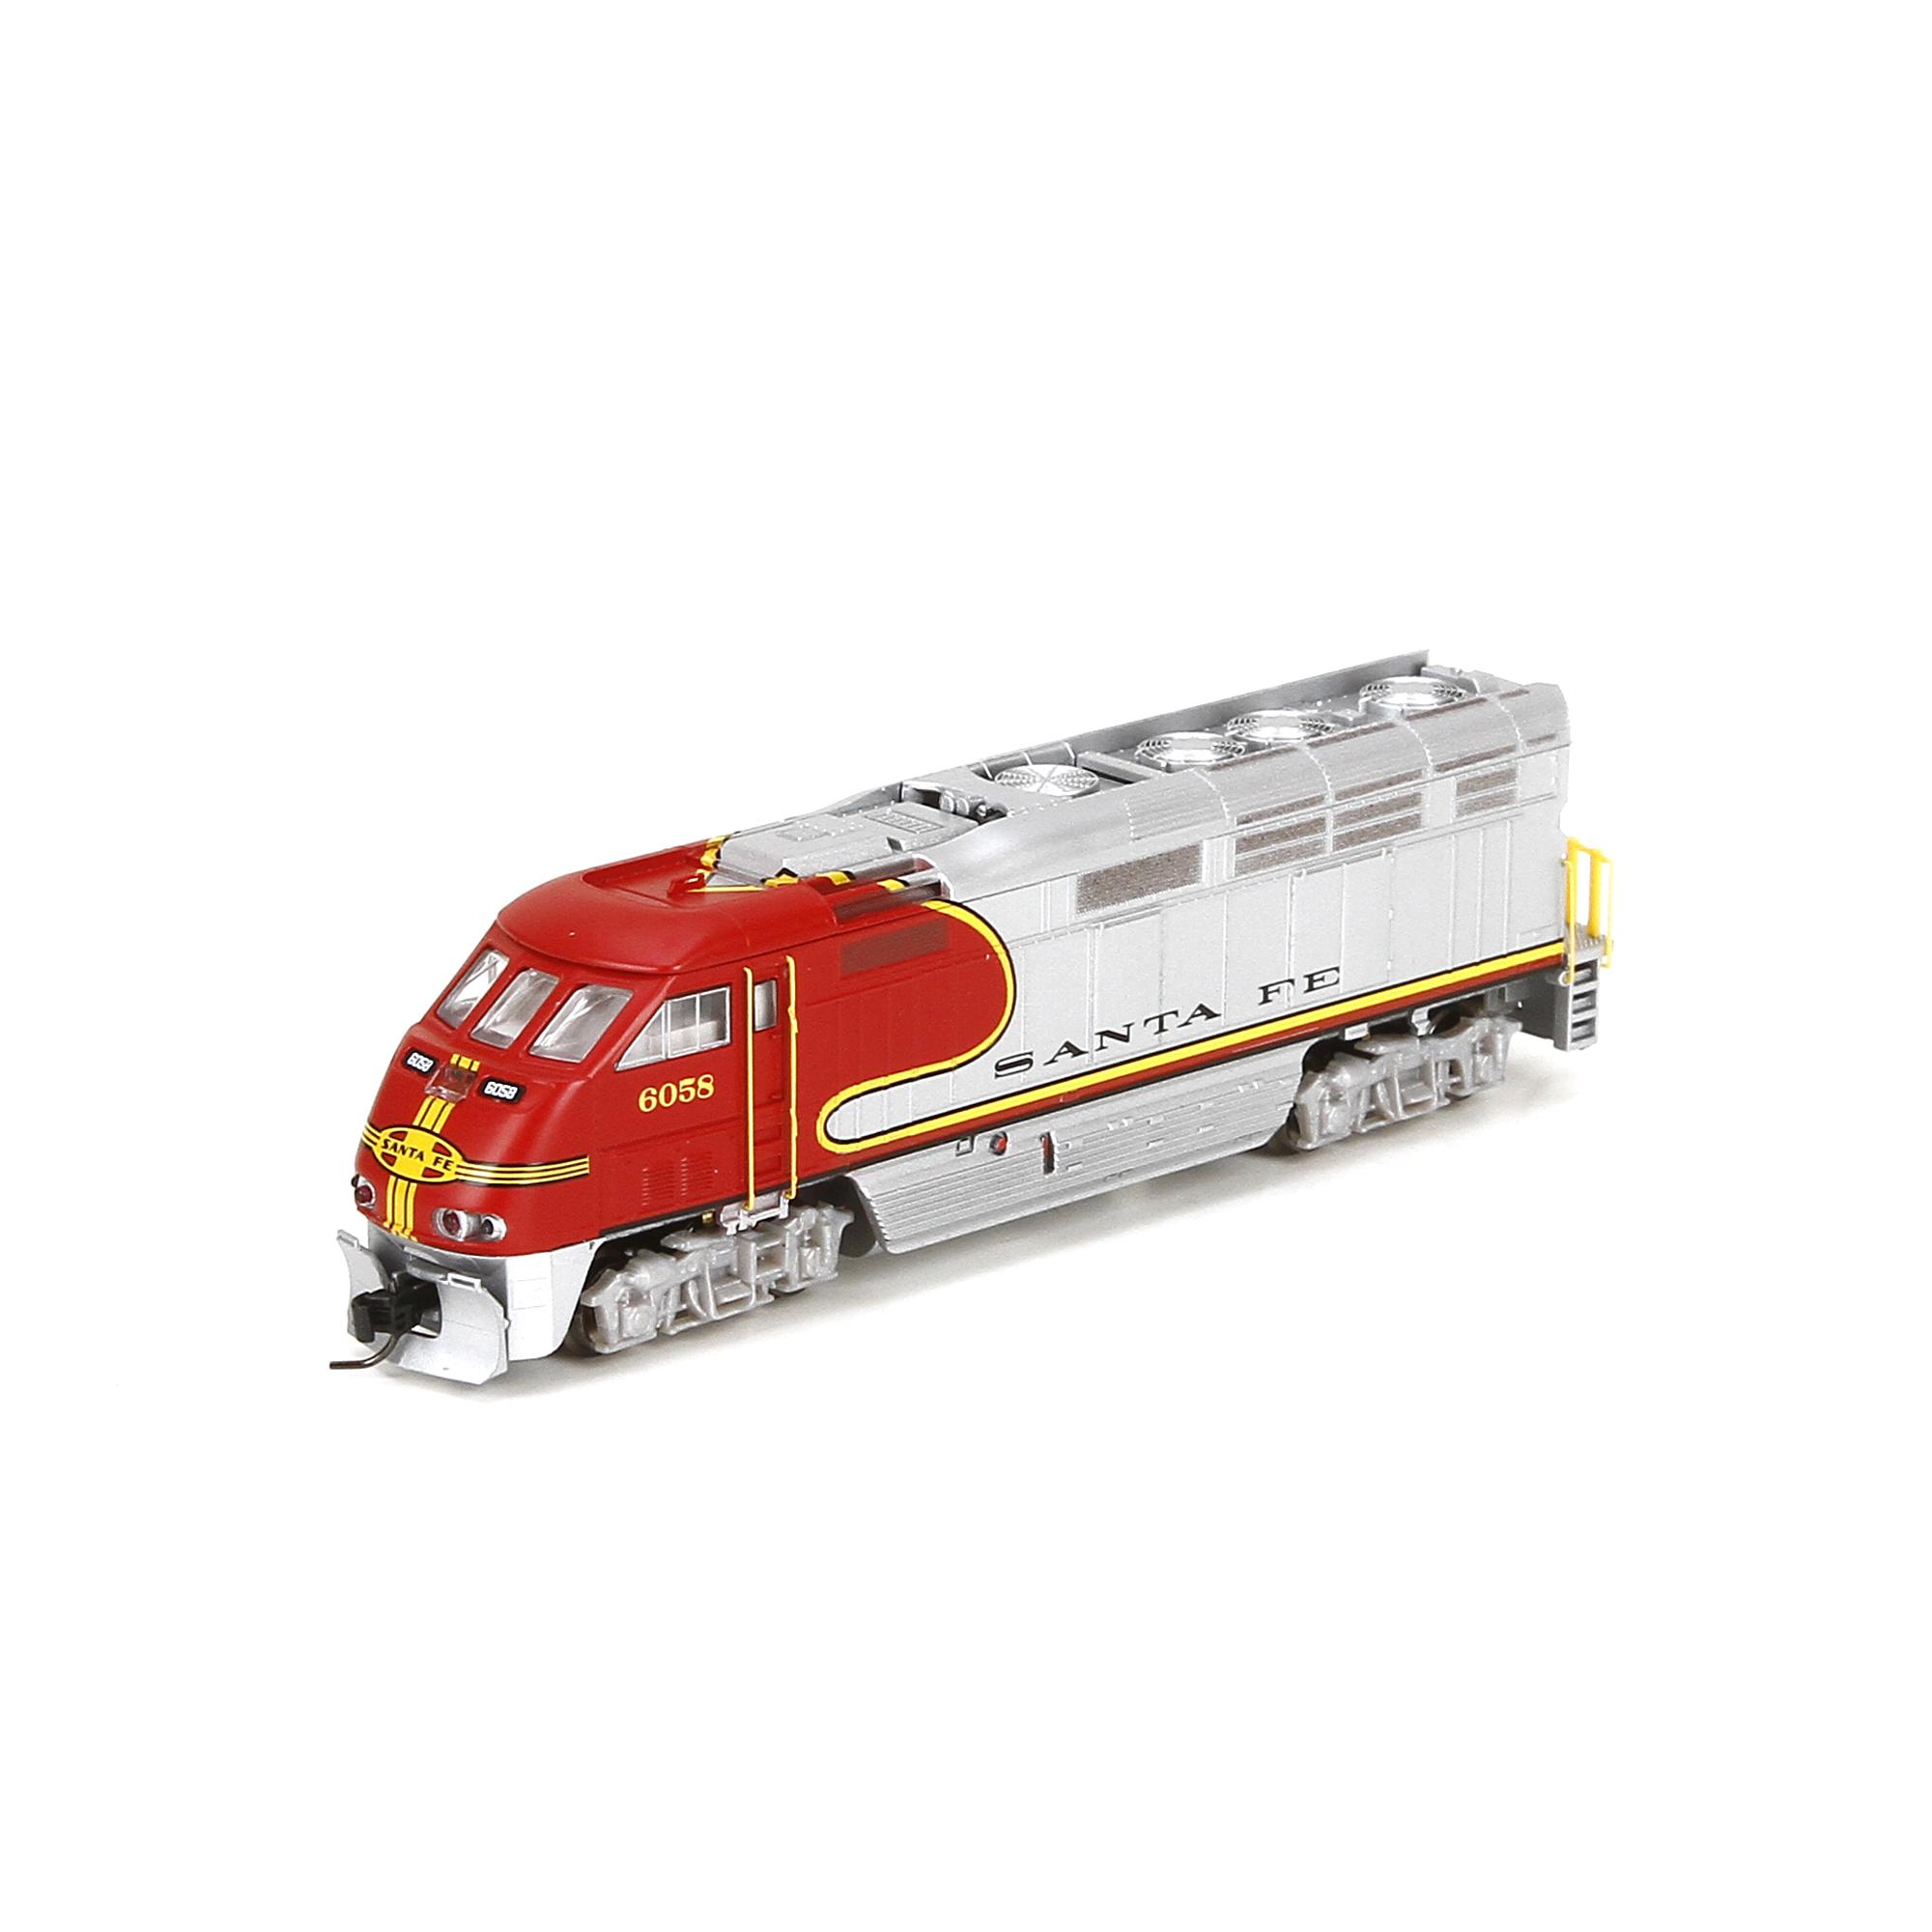 N Scale - Athearn - 23776 - Locomotive, Diesel, EMD F59PHi - Santa Fe - 6058